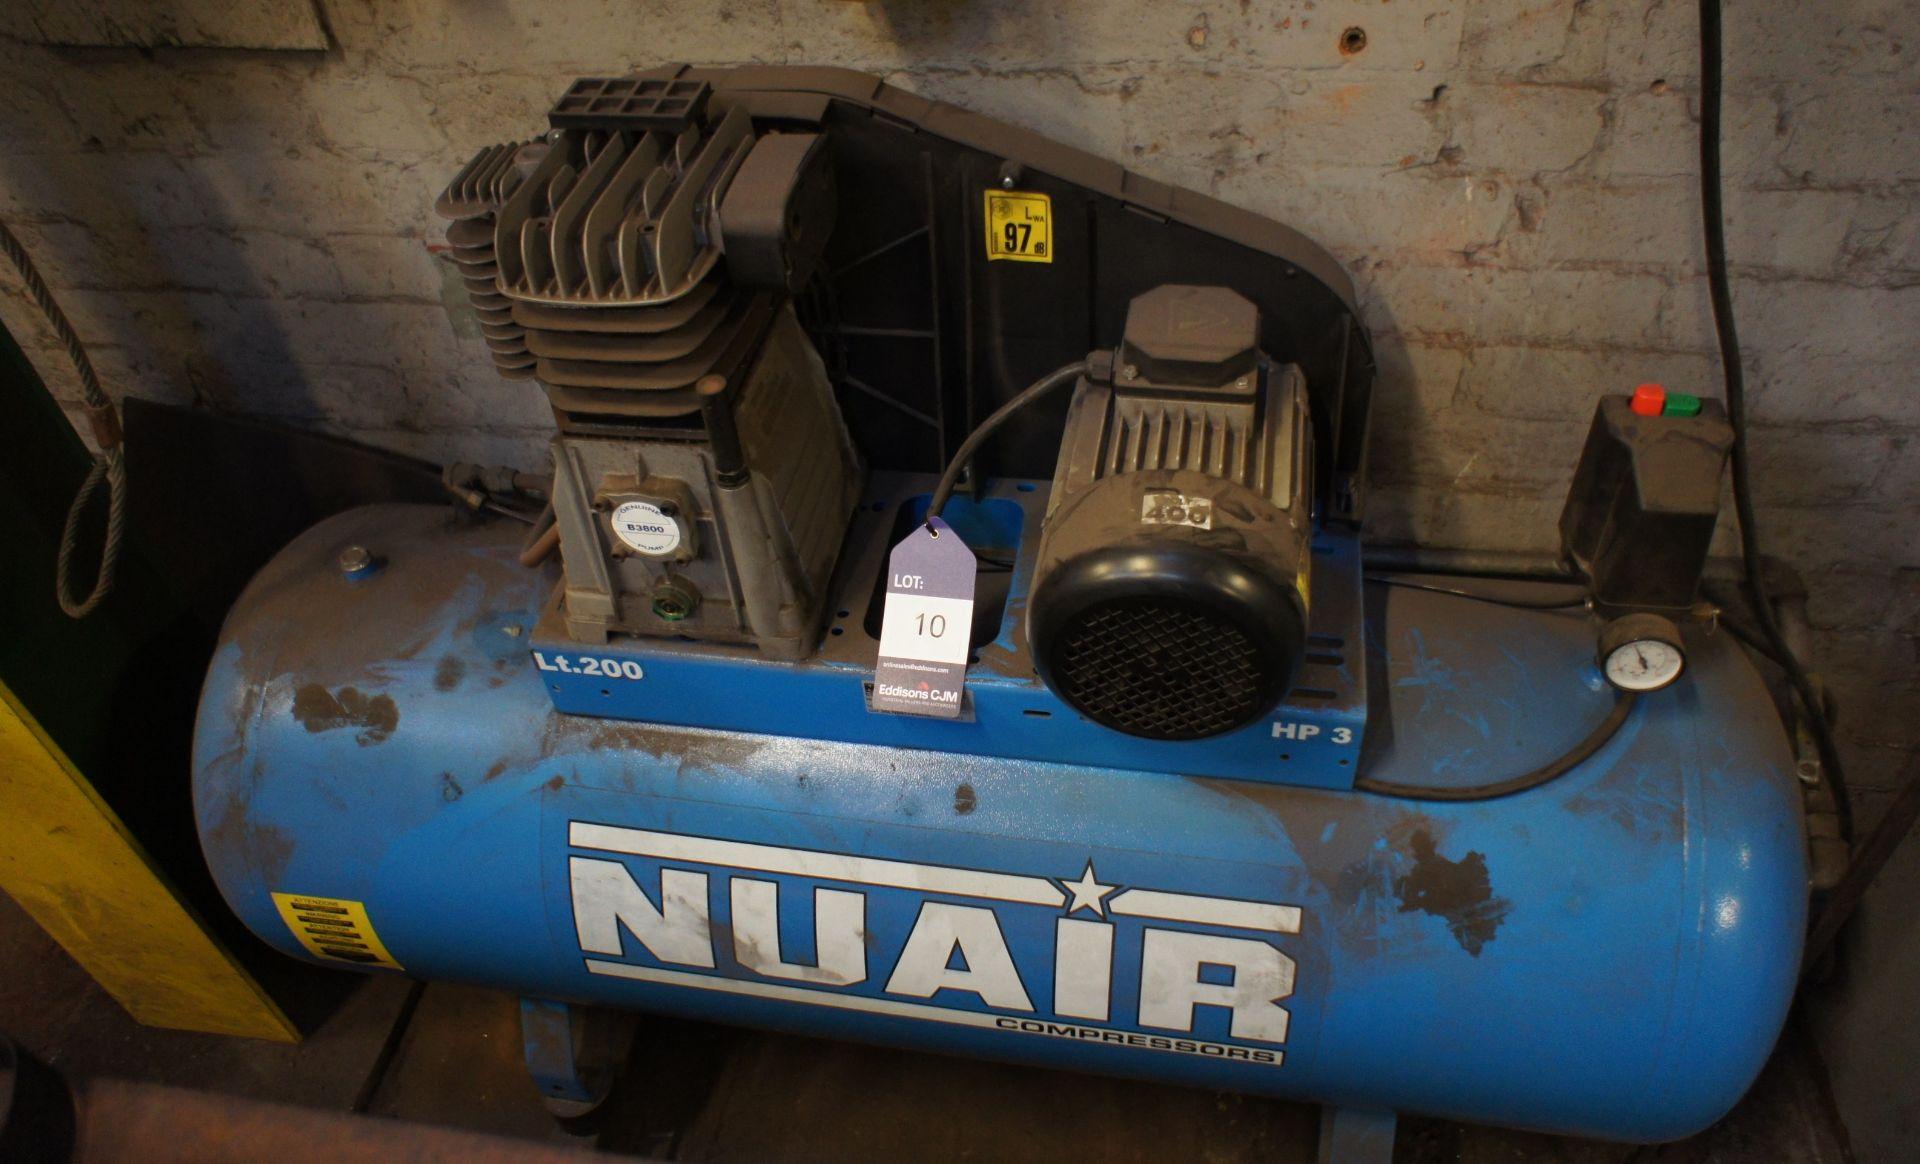 Nuair HP3 Receiver mounted Workshop Compressor, 20 - Image 3 of 4